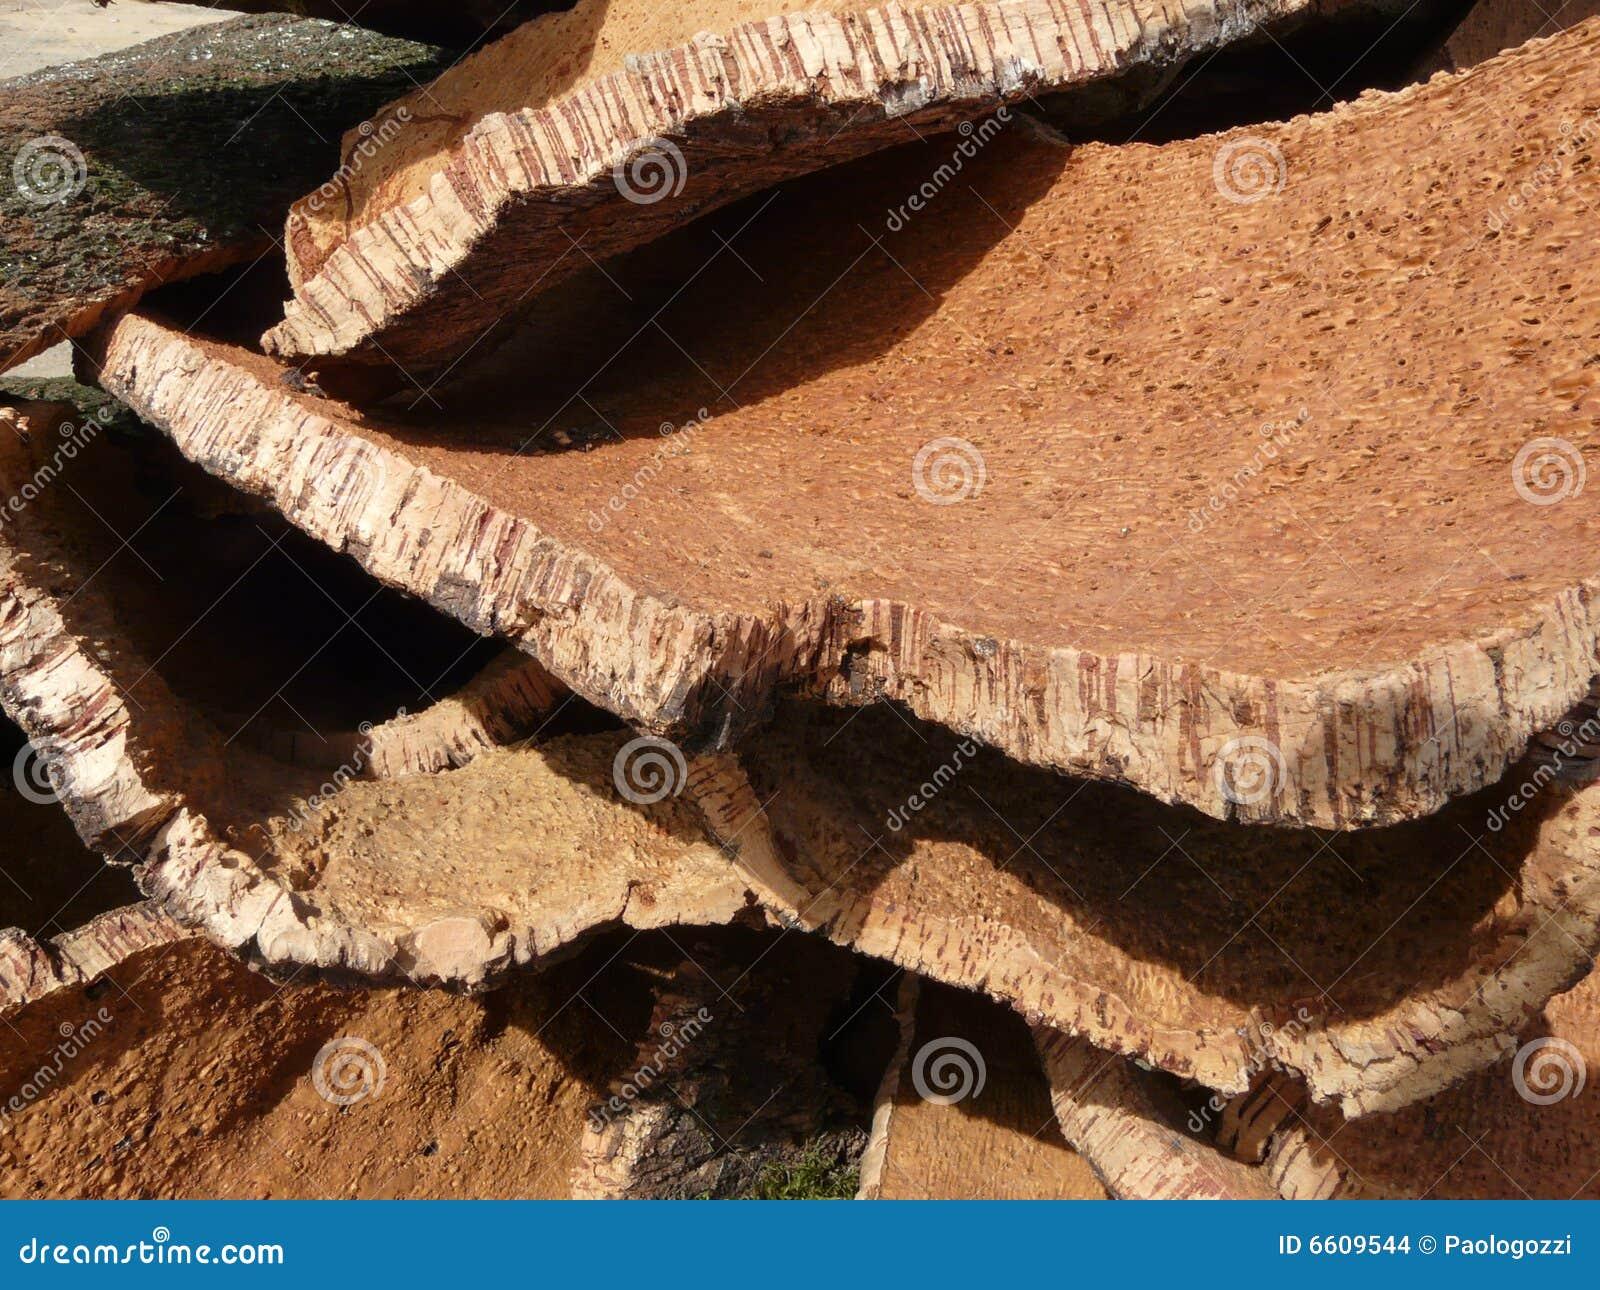 Cork layers